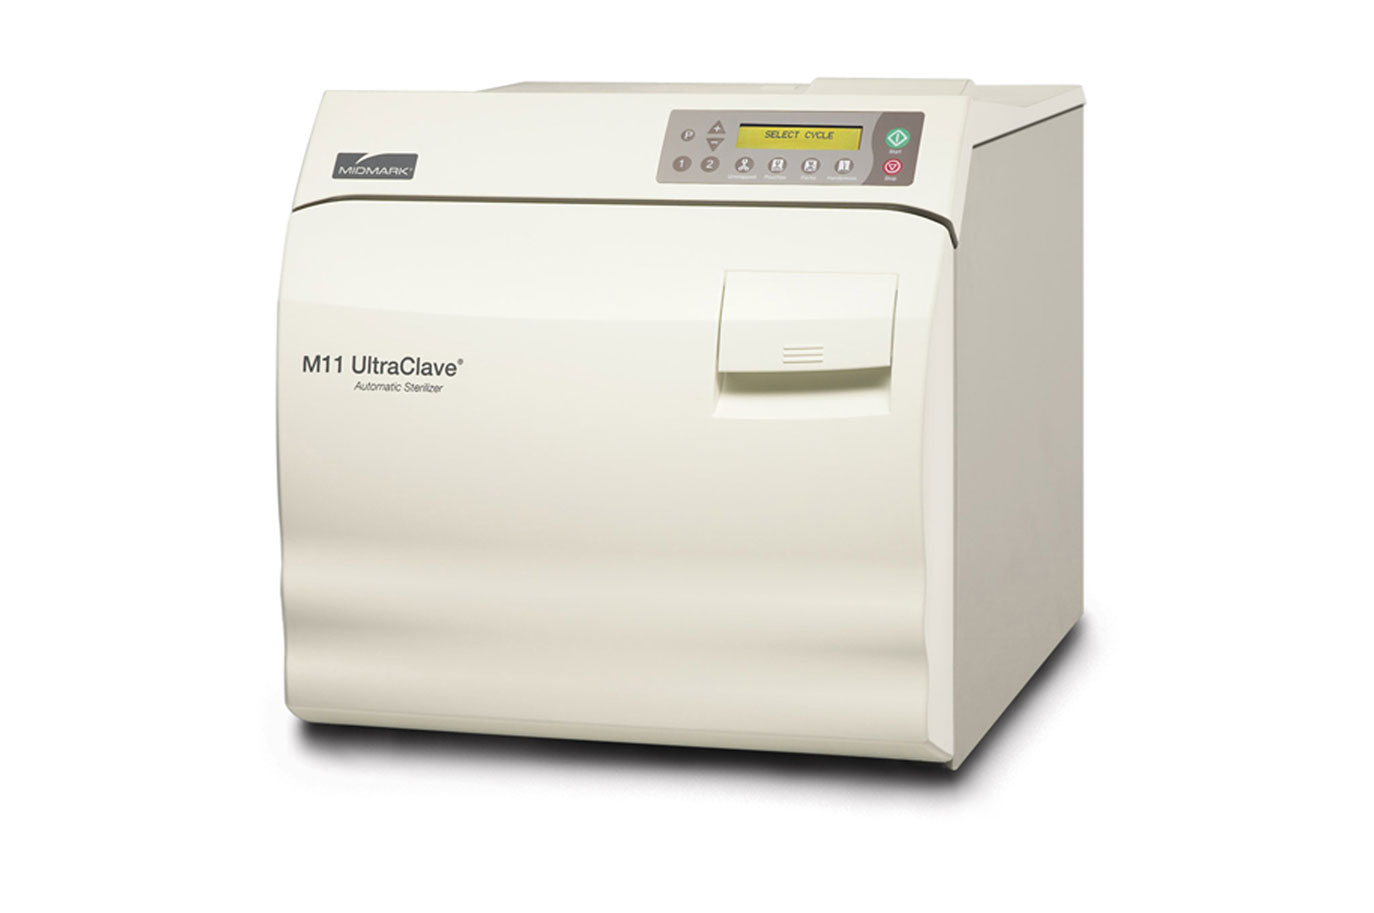 midmark m11 ultraclave automatic sterilizer rh midmark com Midmark Autoclave Parts Ritter M11 Ultraclave Manual